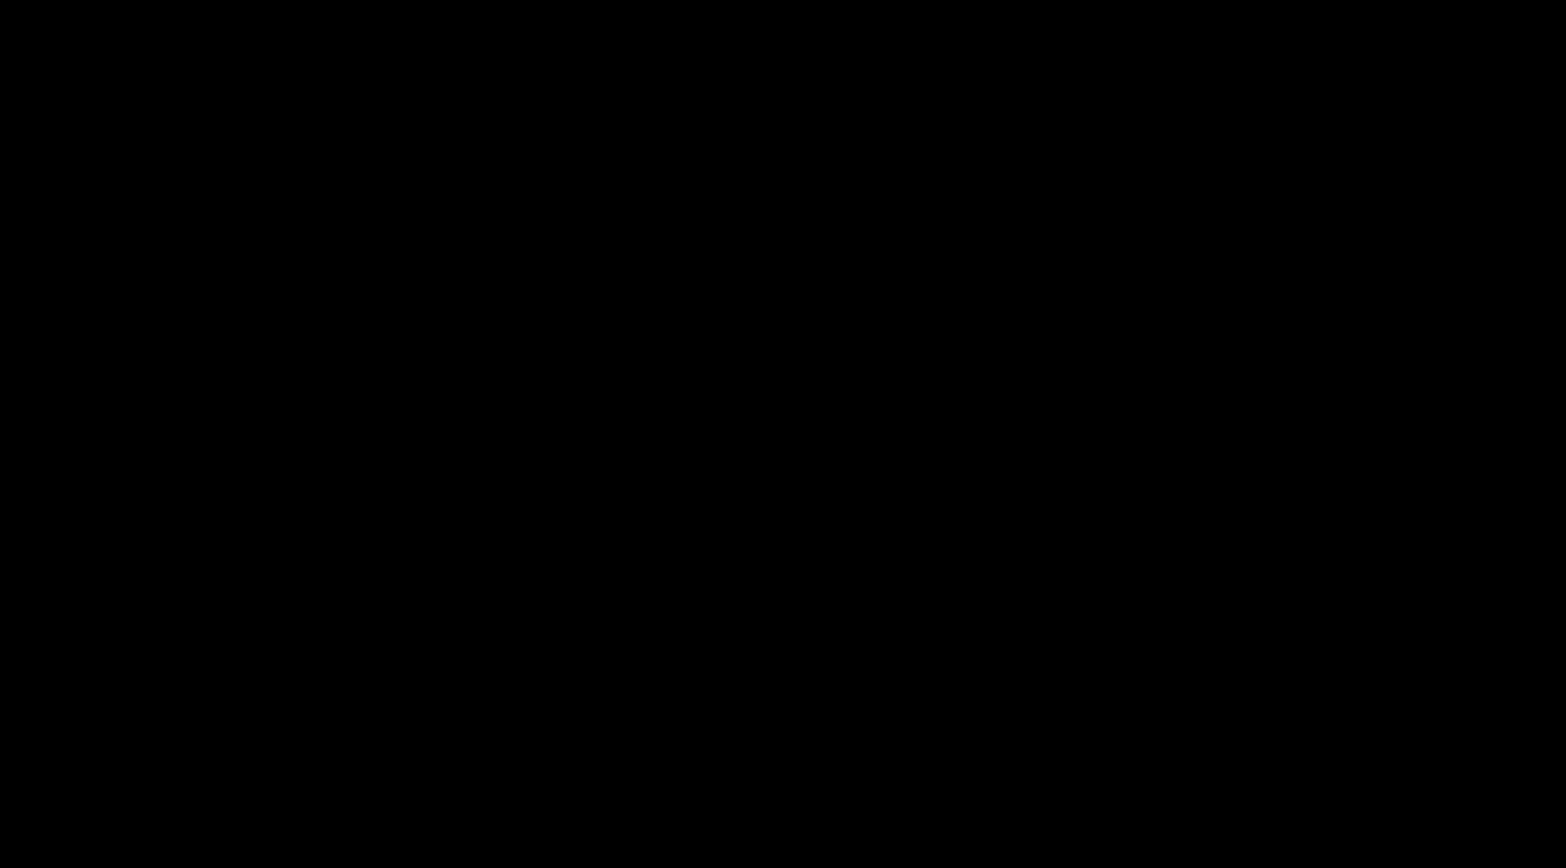 4-Benzyloxy-2-fluorobenzeneboronic acid pinacol ester